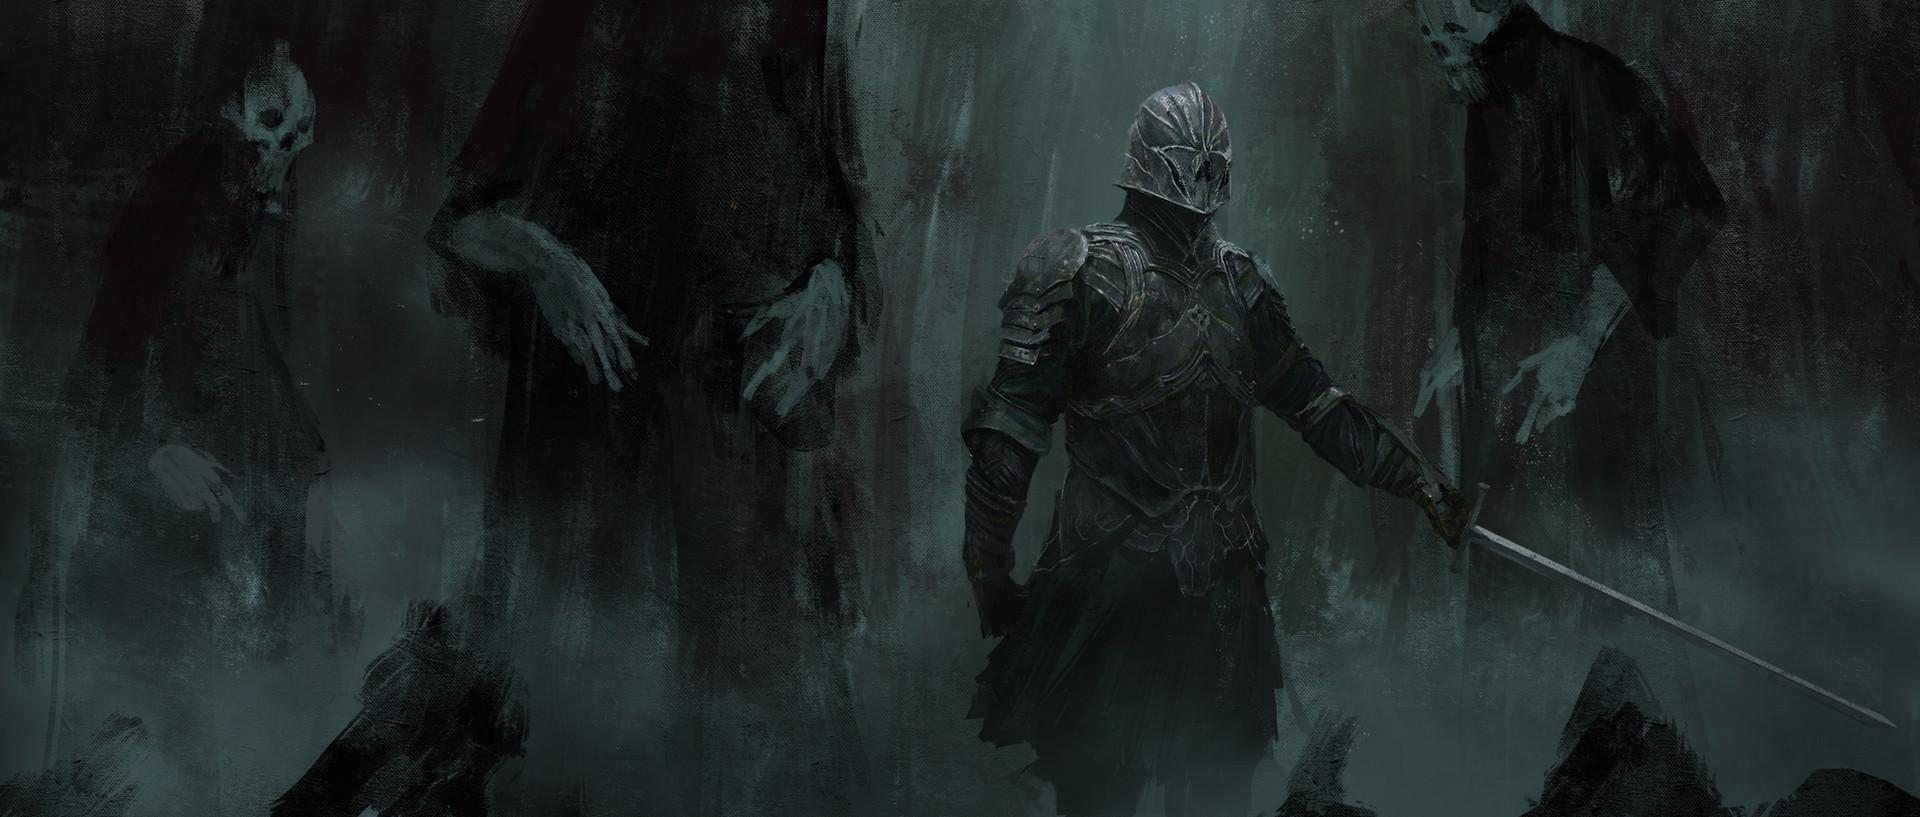 Elias ravanetti elias ravanetti grave watchers